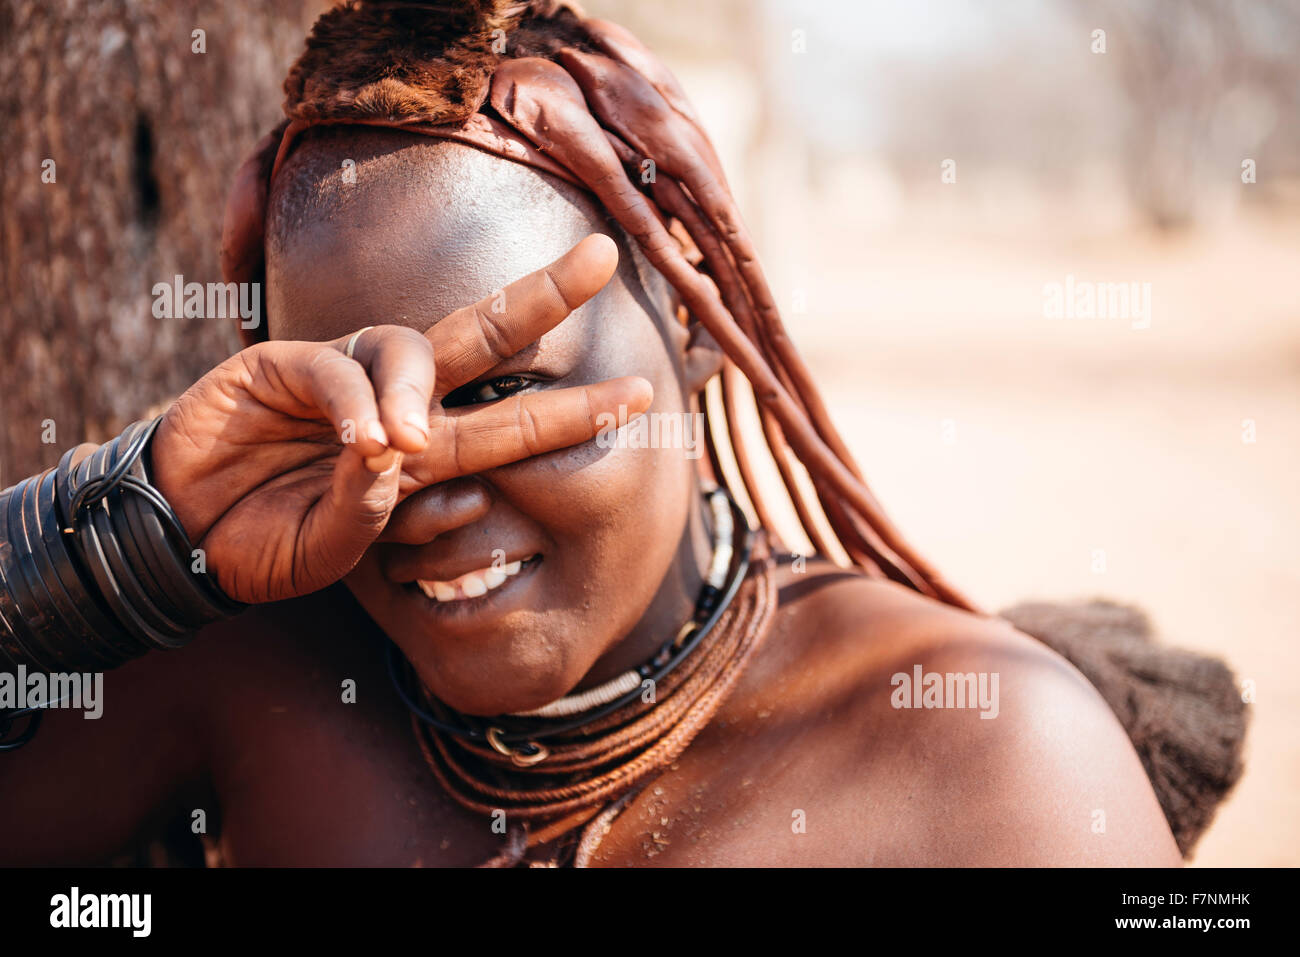 La Namibie, Damaraland, portrait of smiling woman making Himba victoire Banque D'Images